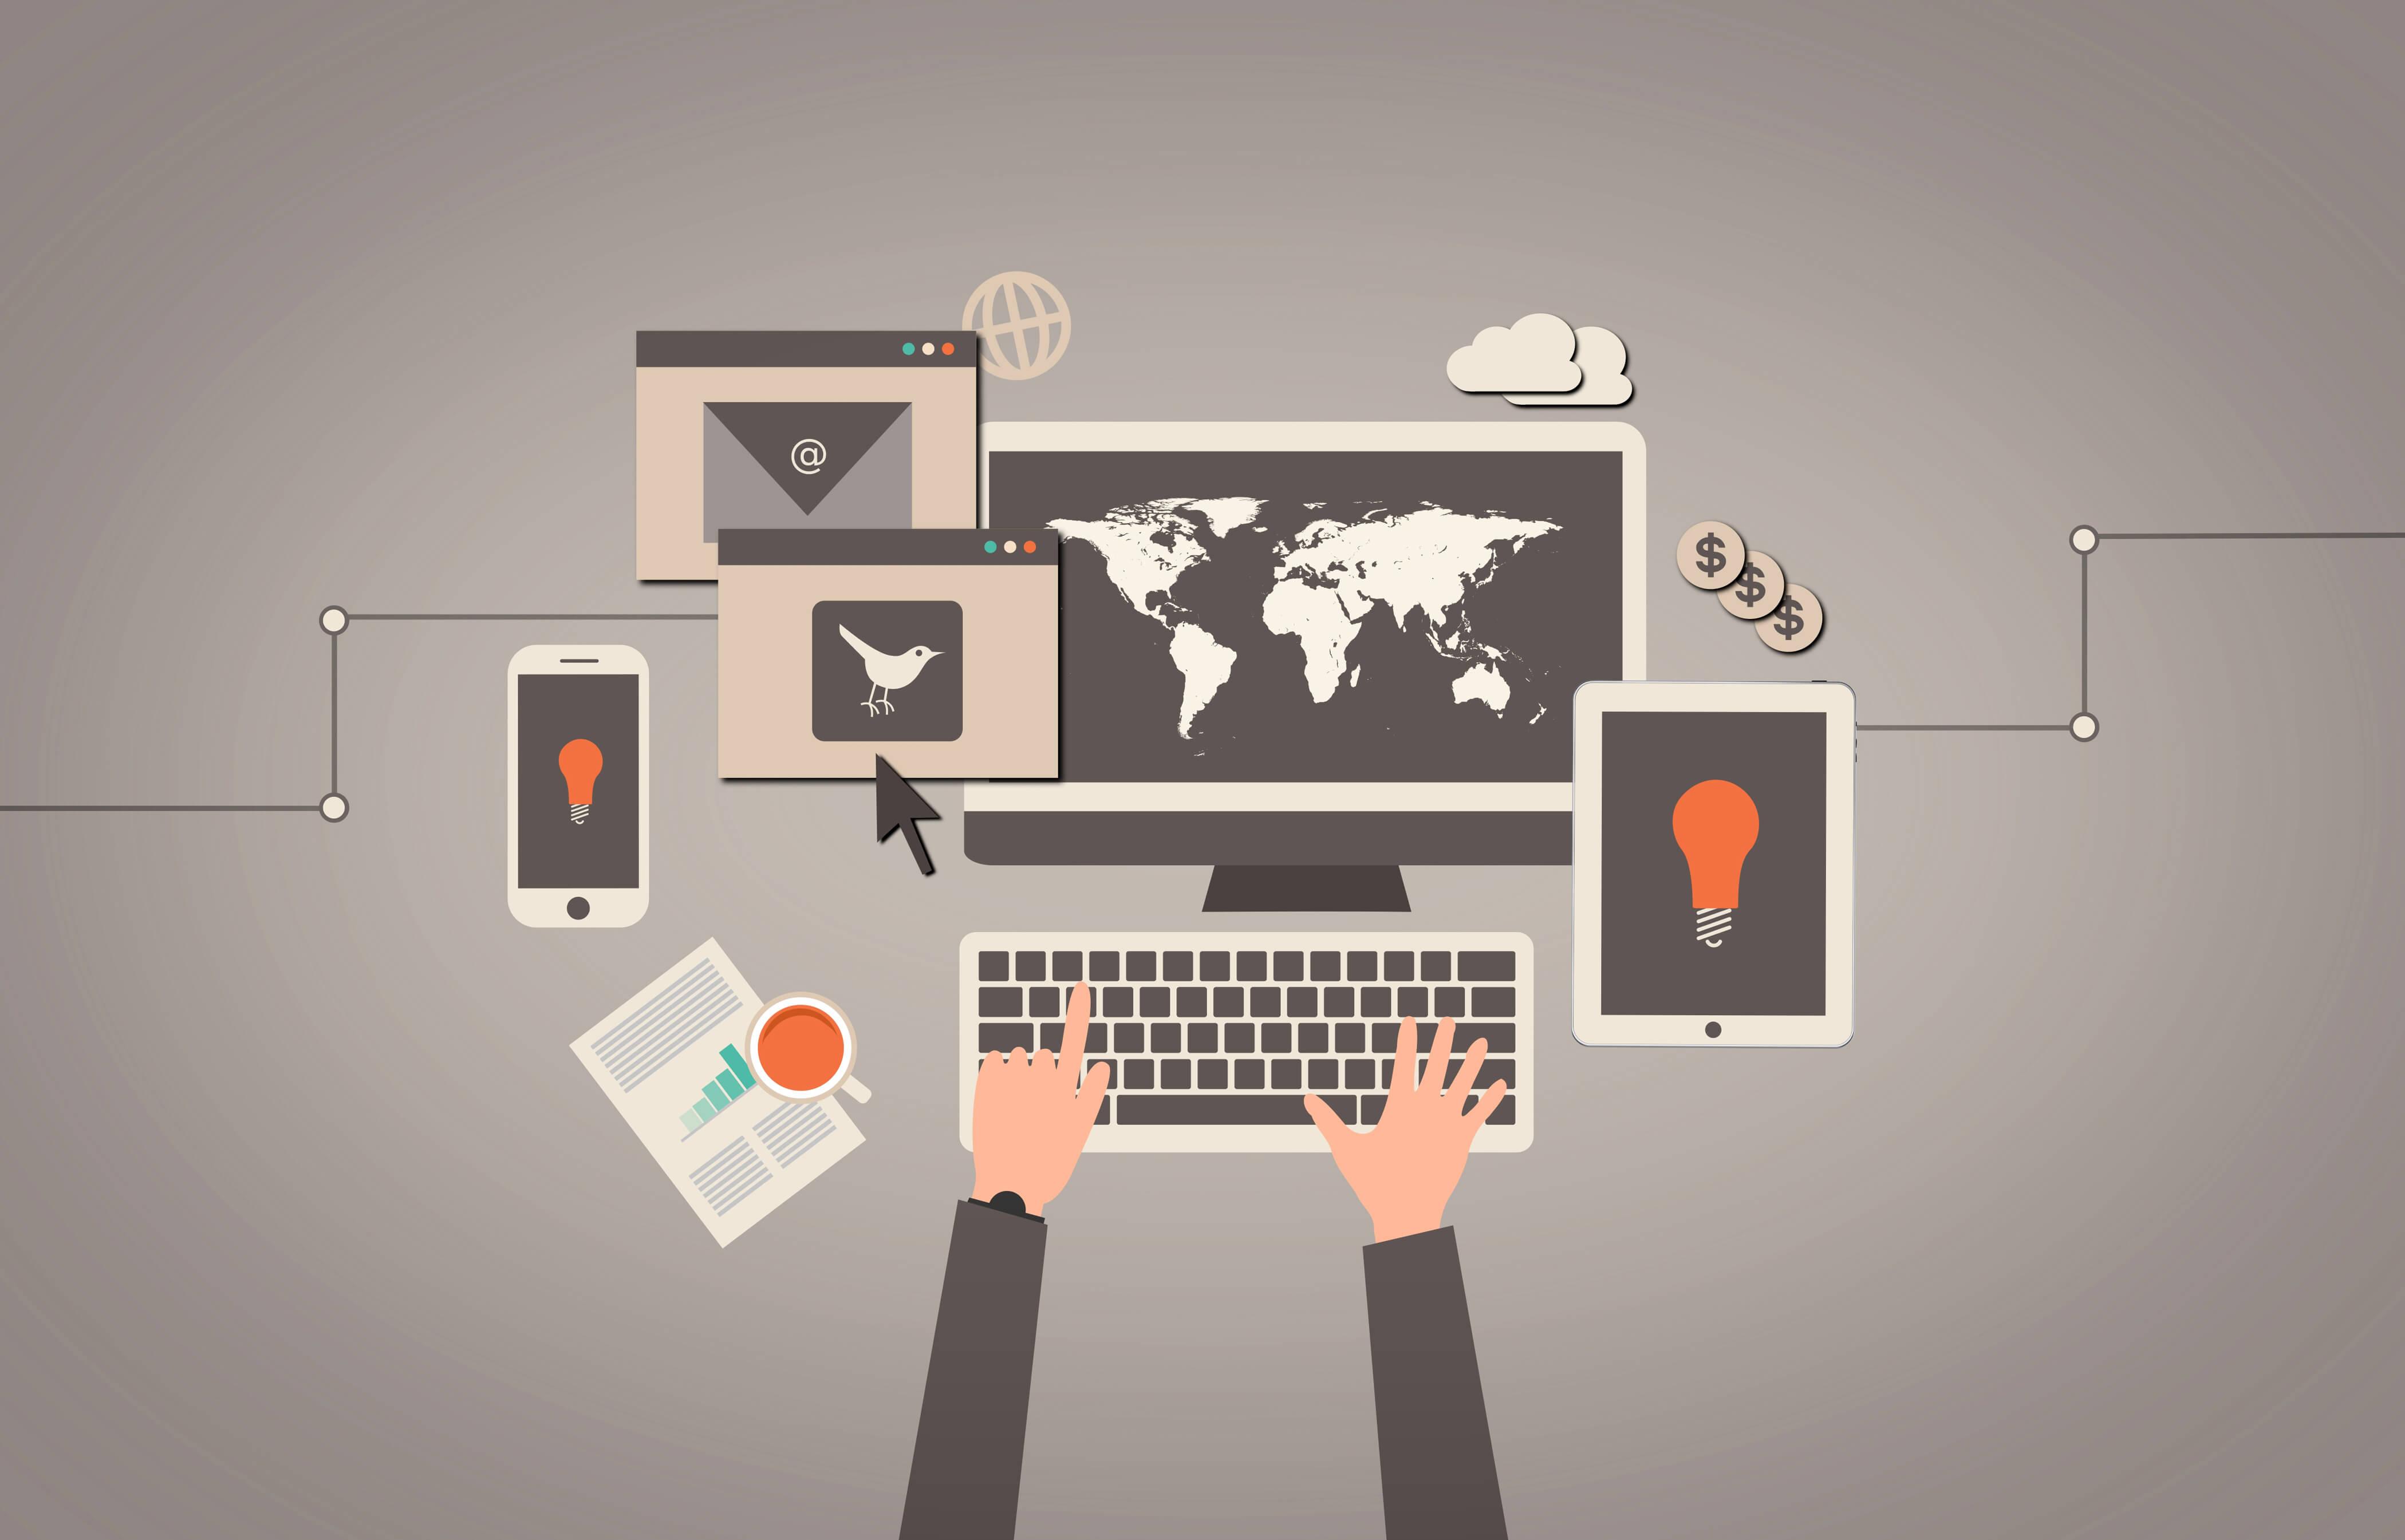 ciberseguridad | Hubdigital